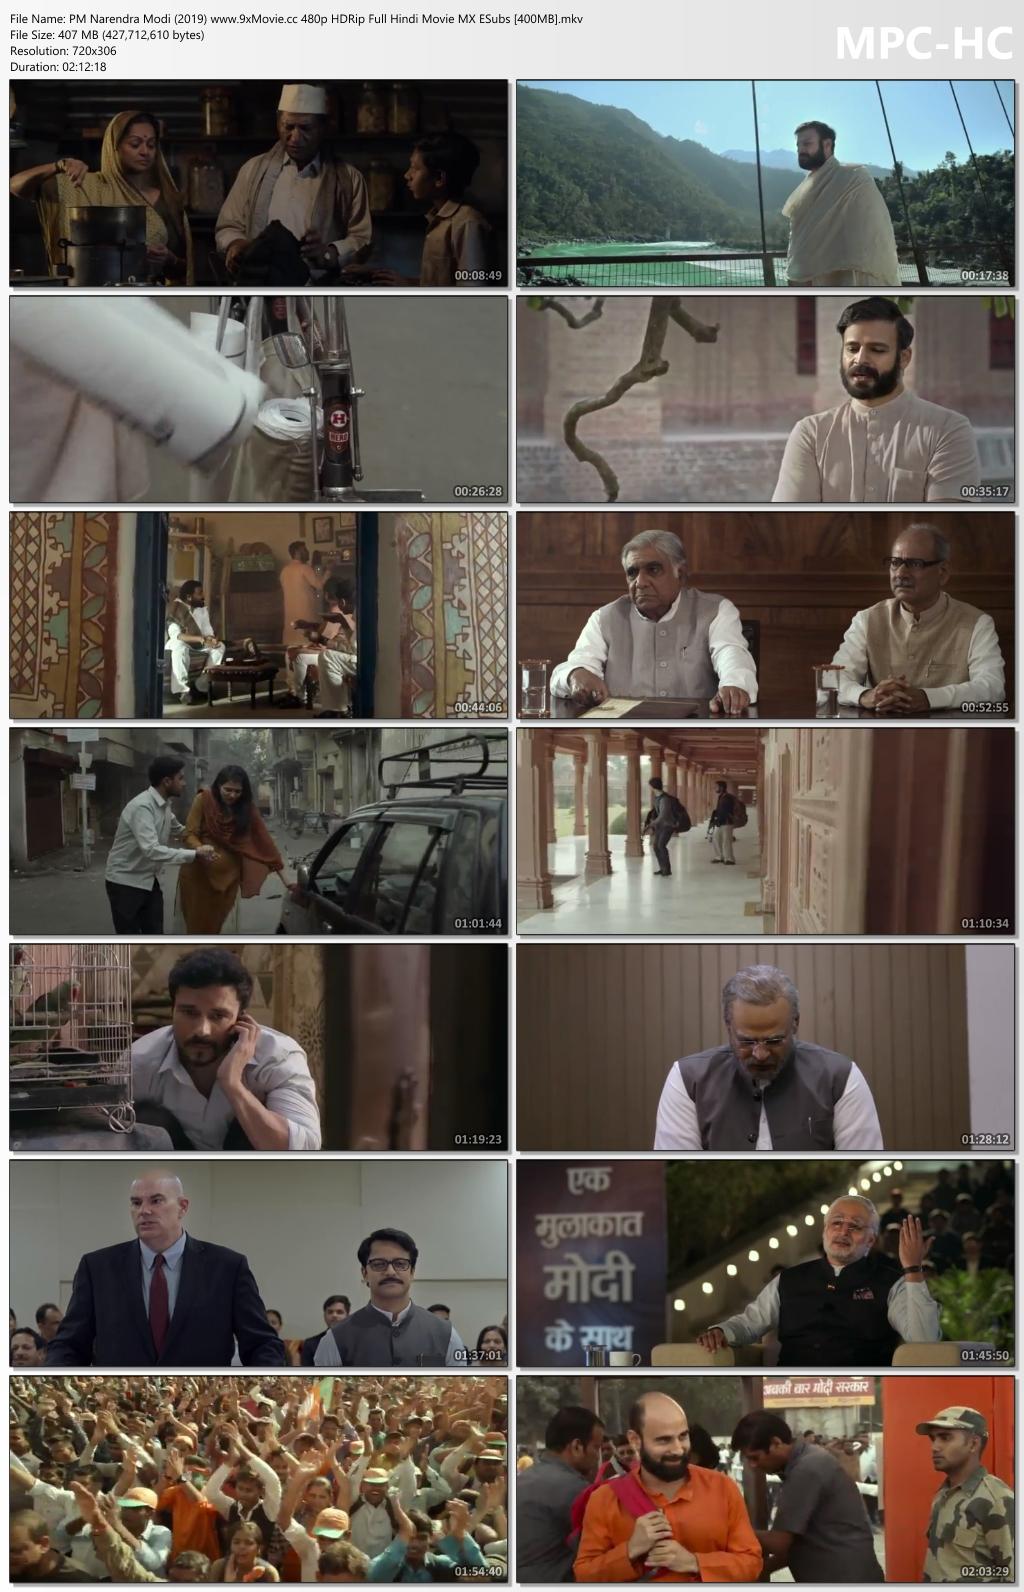 PM-Narendra-Modi-2019-www-9x-Movie-cc-480p-HDRip-Full-Hindi-Movie-MX-ESubs-400-MB-mkv